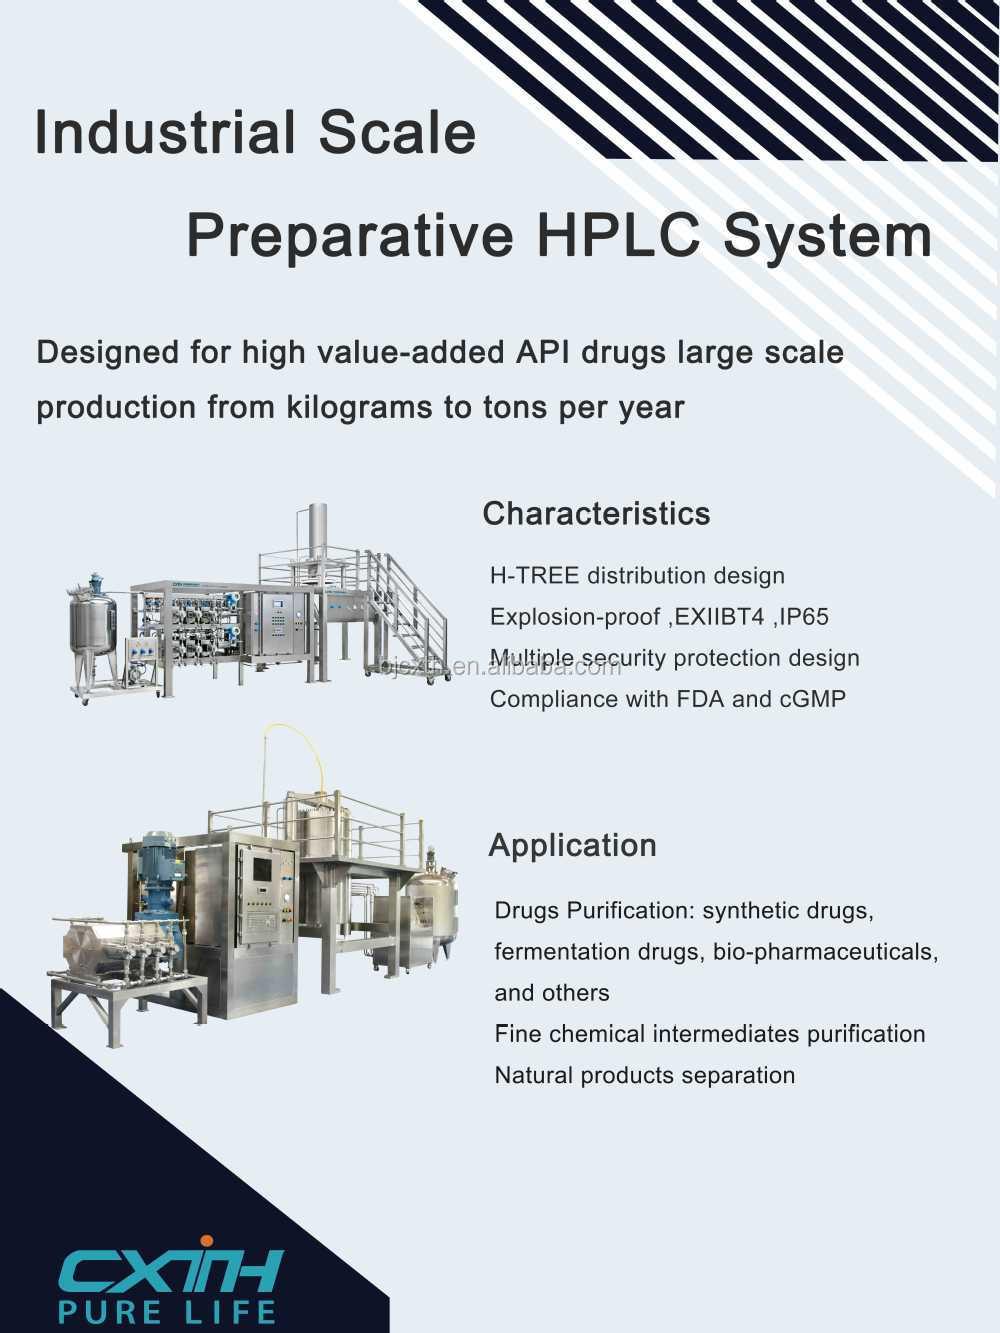 Industrial preperative high performance liquid chromatography industrial preperative high performance liquid chromatography pooptronica Images